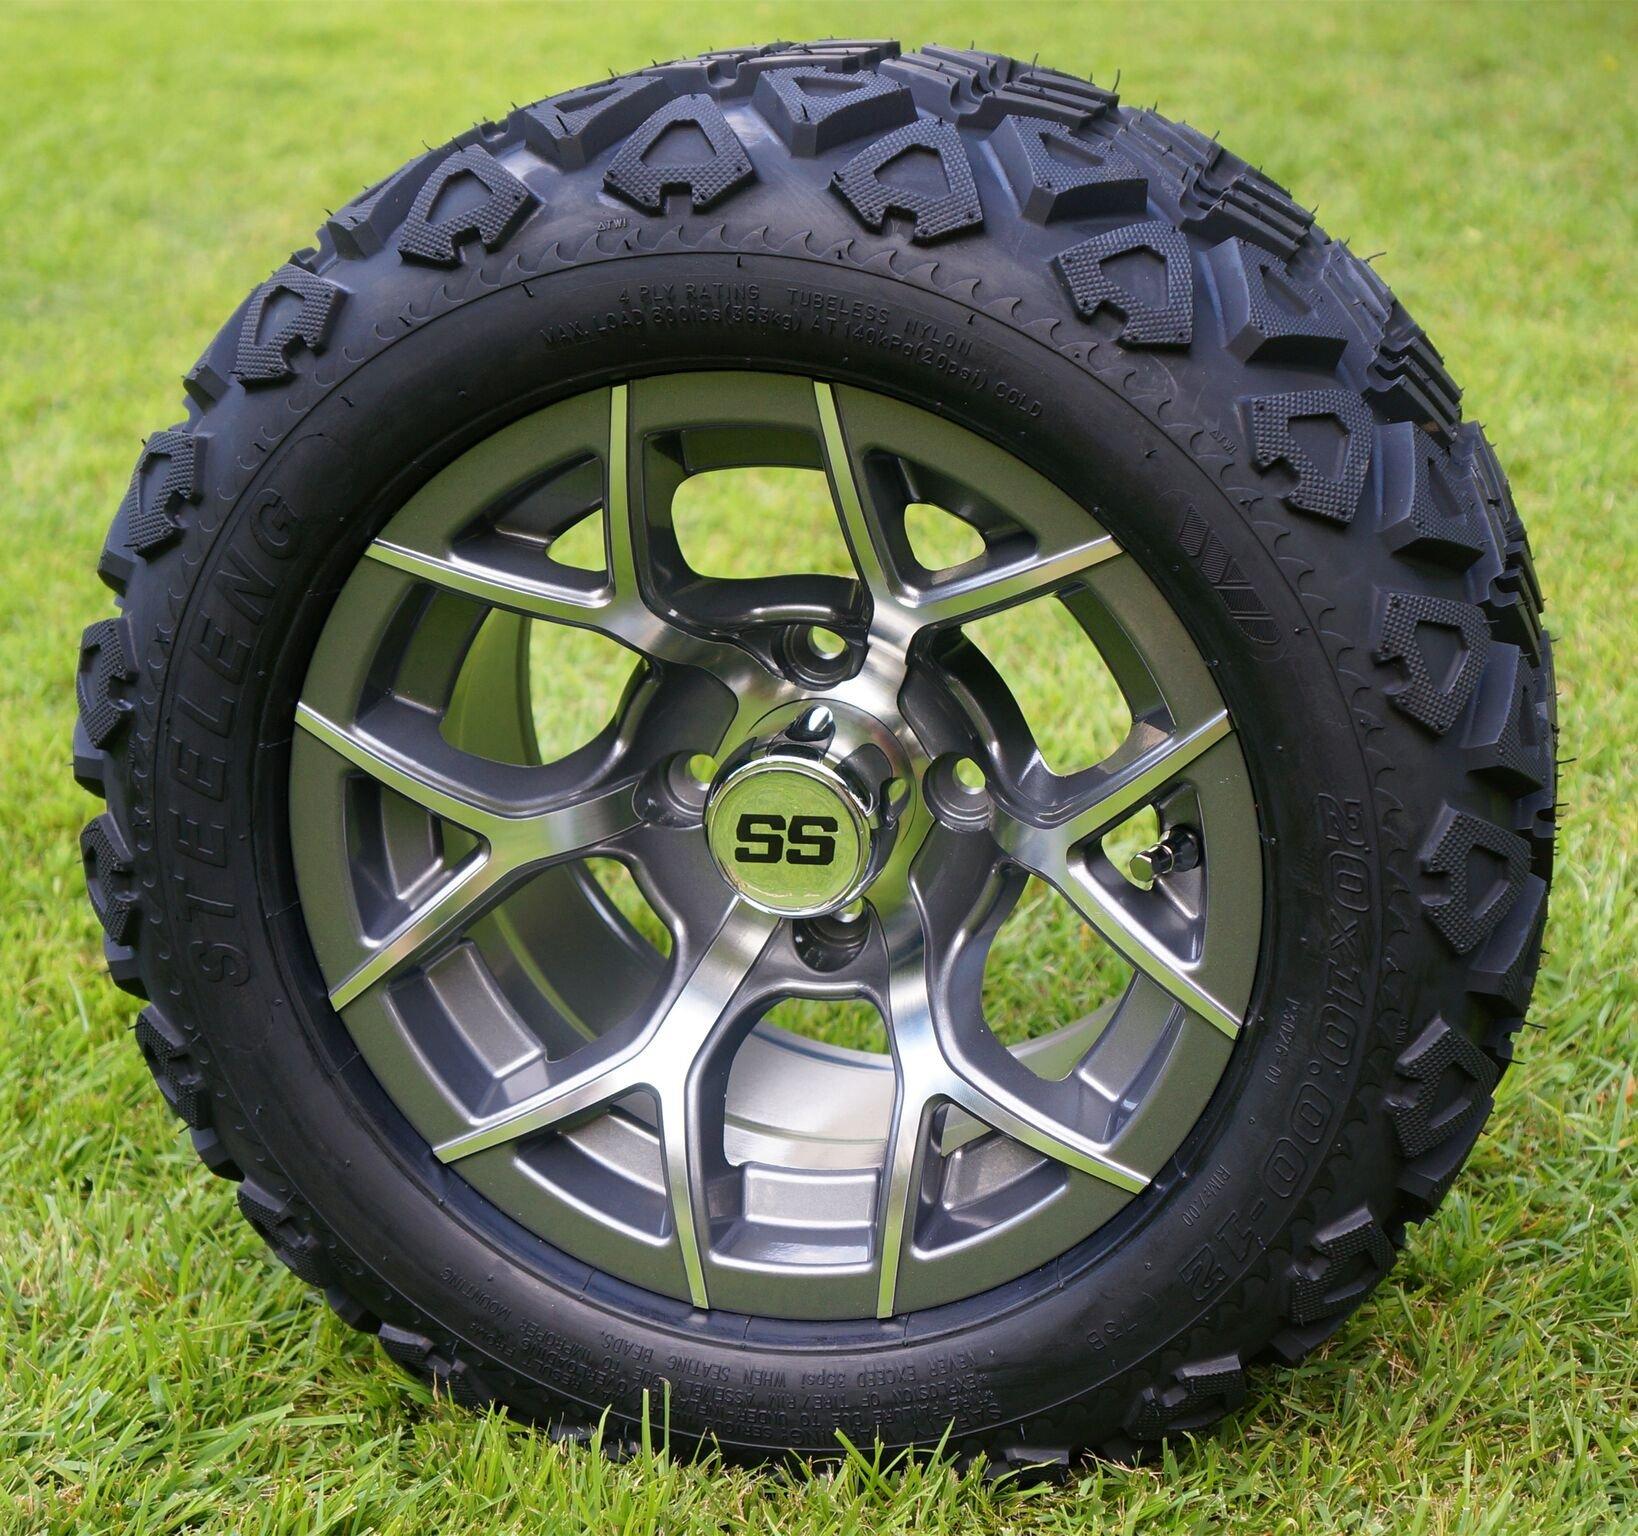 12'' RALLY Gunmetal Golf Cart Wheels and 20x10-12 DOT All Terrain Golf Cart Tires - Set of 4 - NO LIFT REQUIRED (read description)